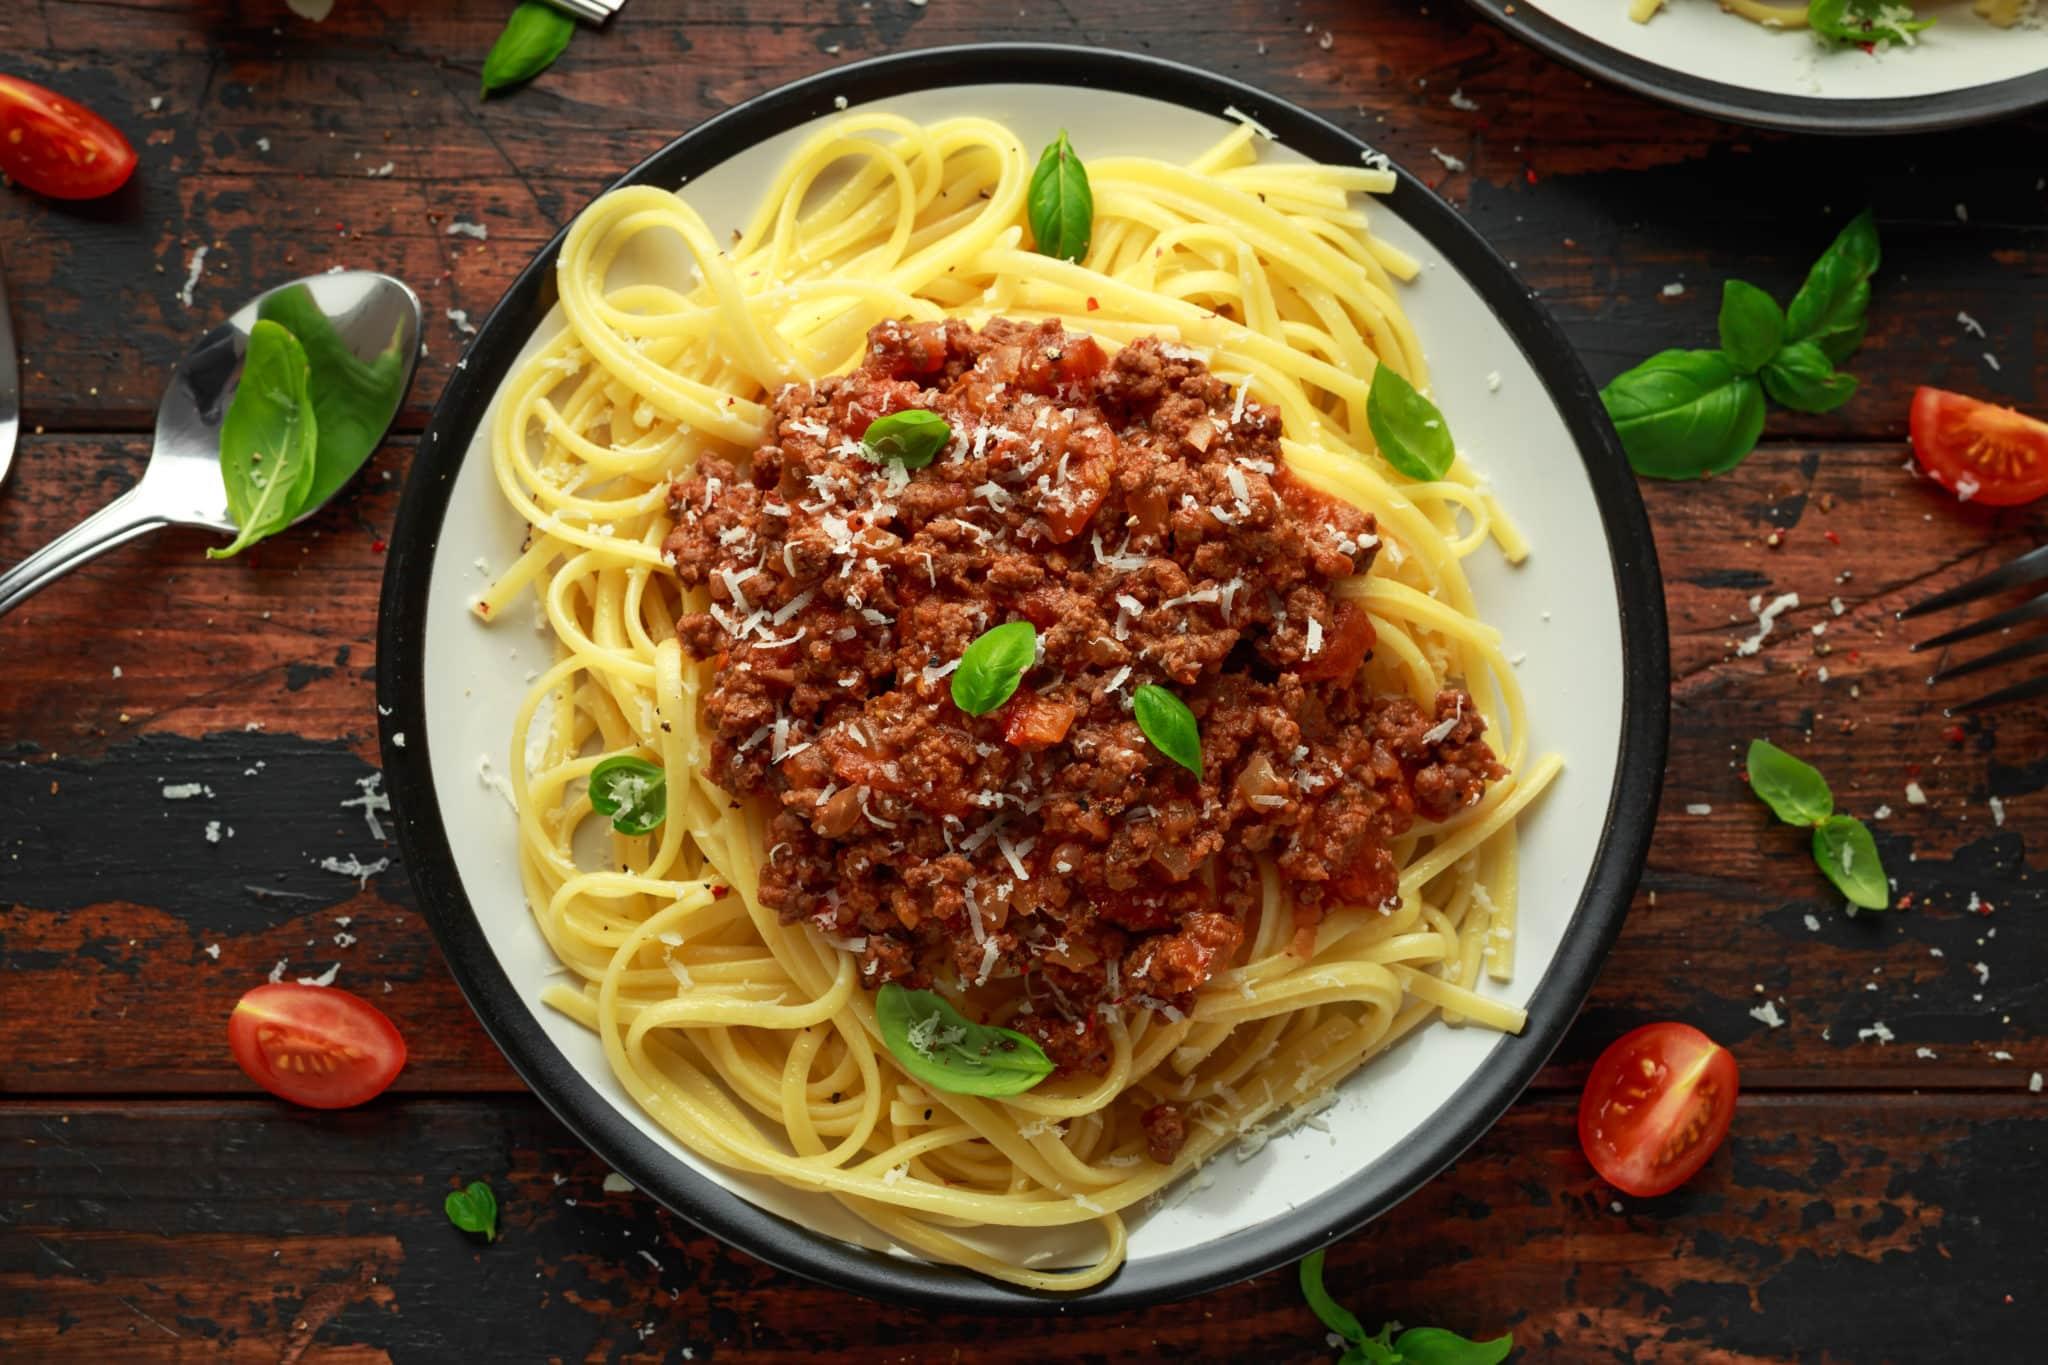 Marisol's vegetarian bolognese sauce